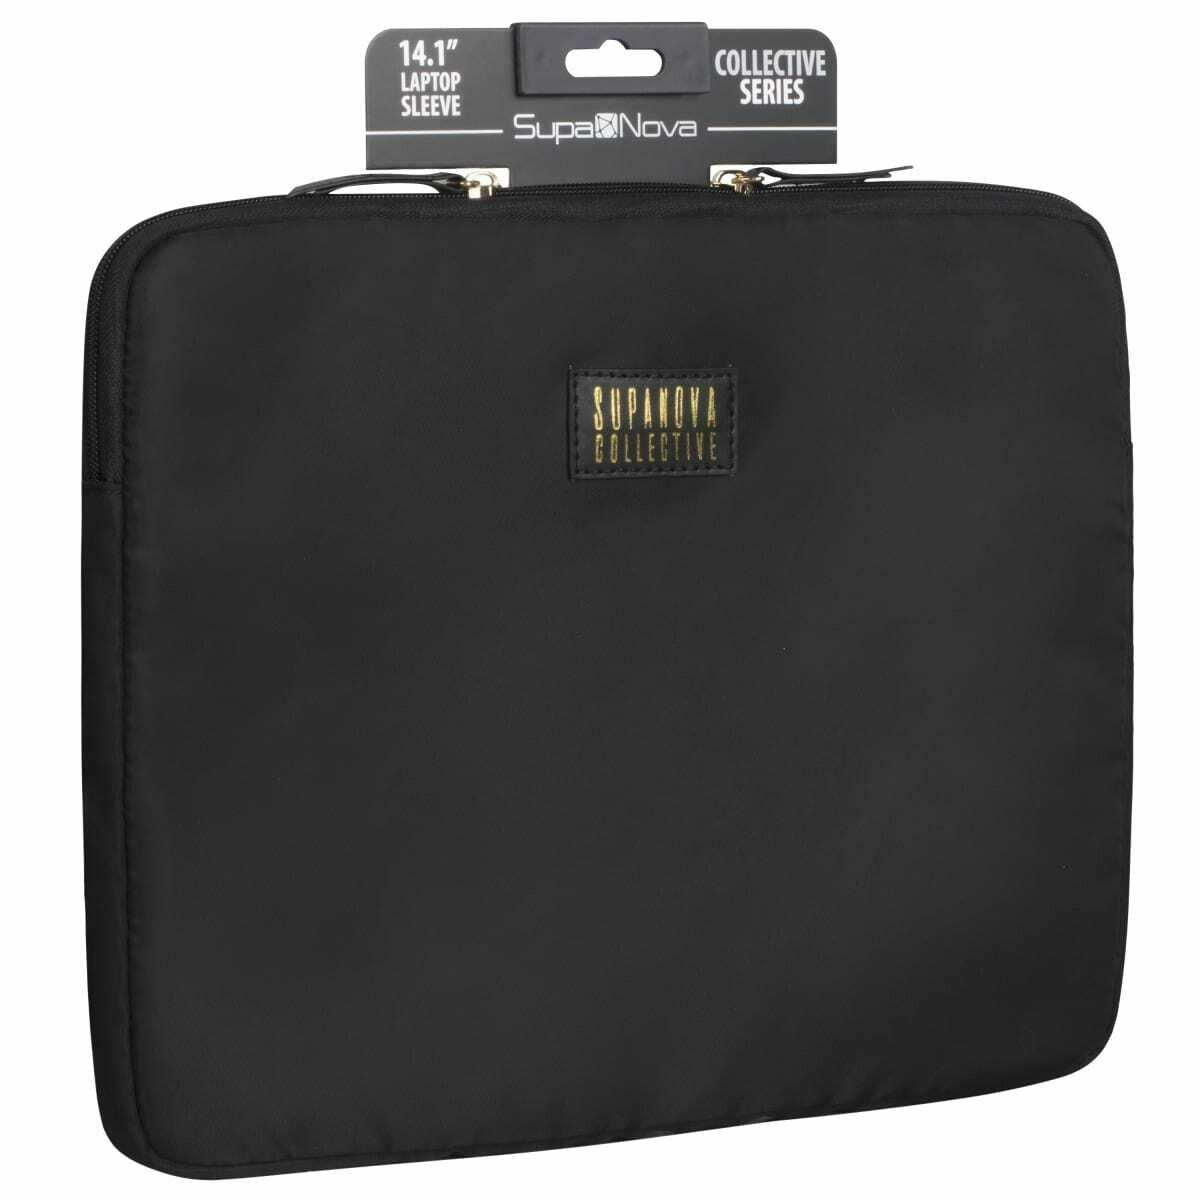 SupaNova Collective Laptop Sleeve 14.1� Black